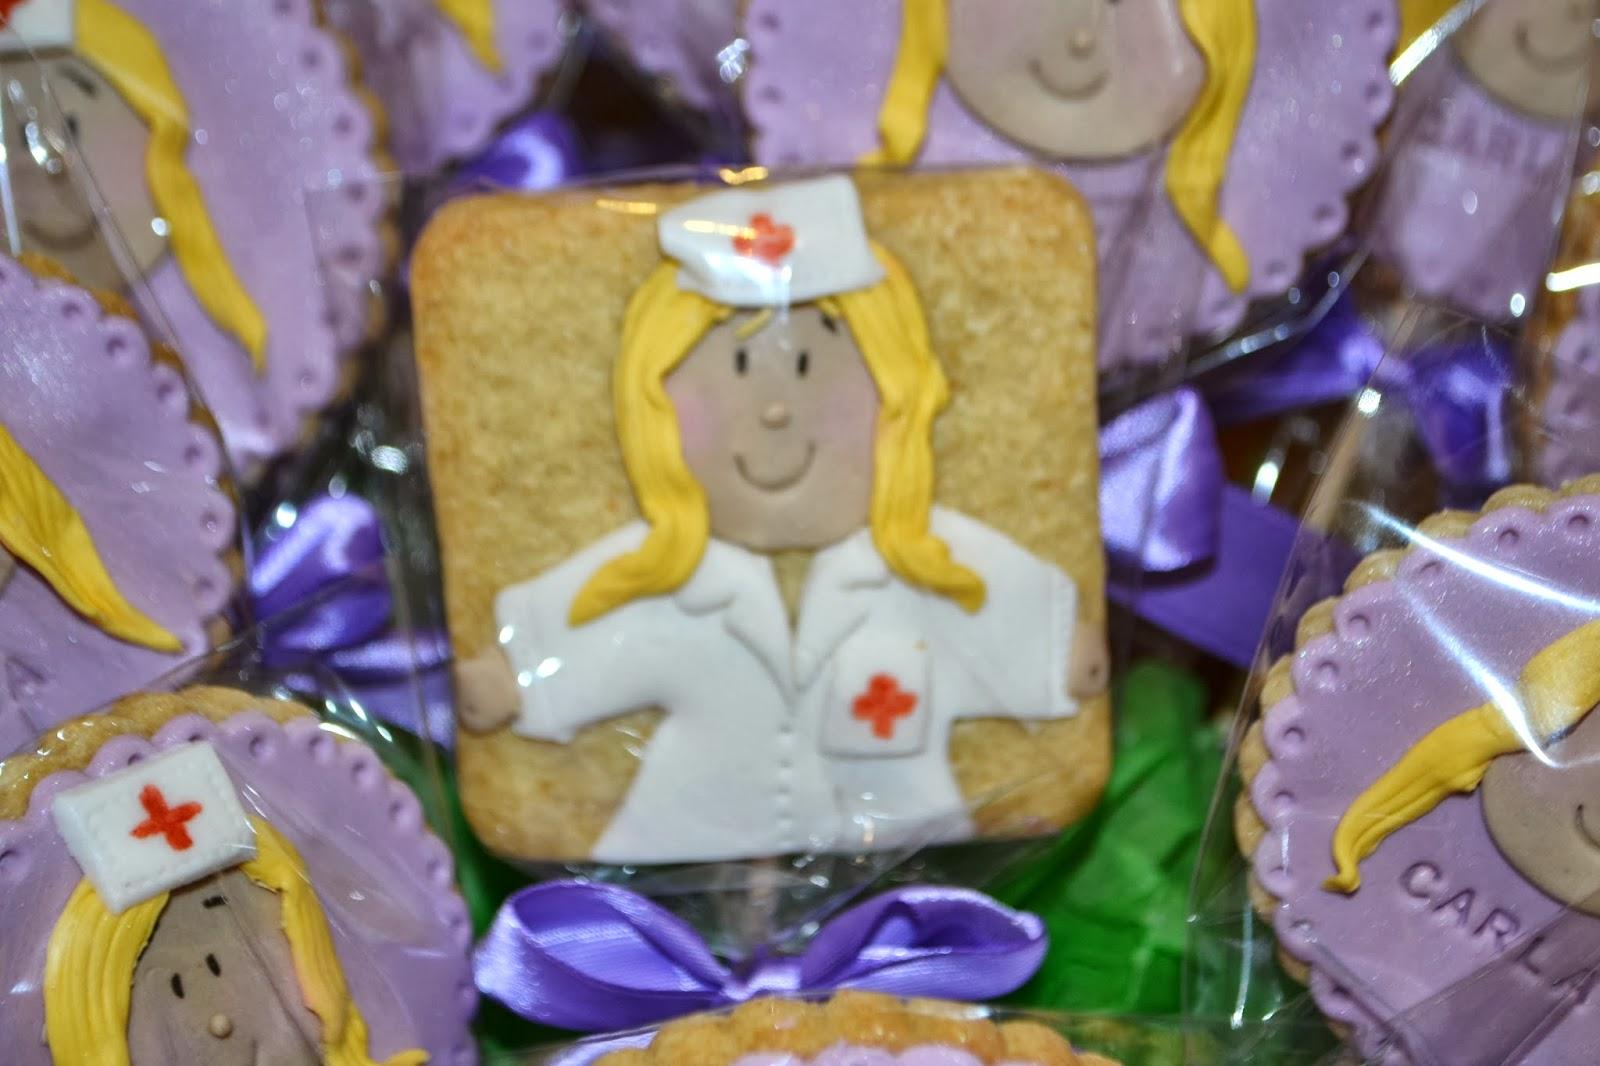 fondant enfermera violeta cumpleaños 18 lazos raso empaquetadas individualmente figura enfermera en 2d